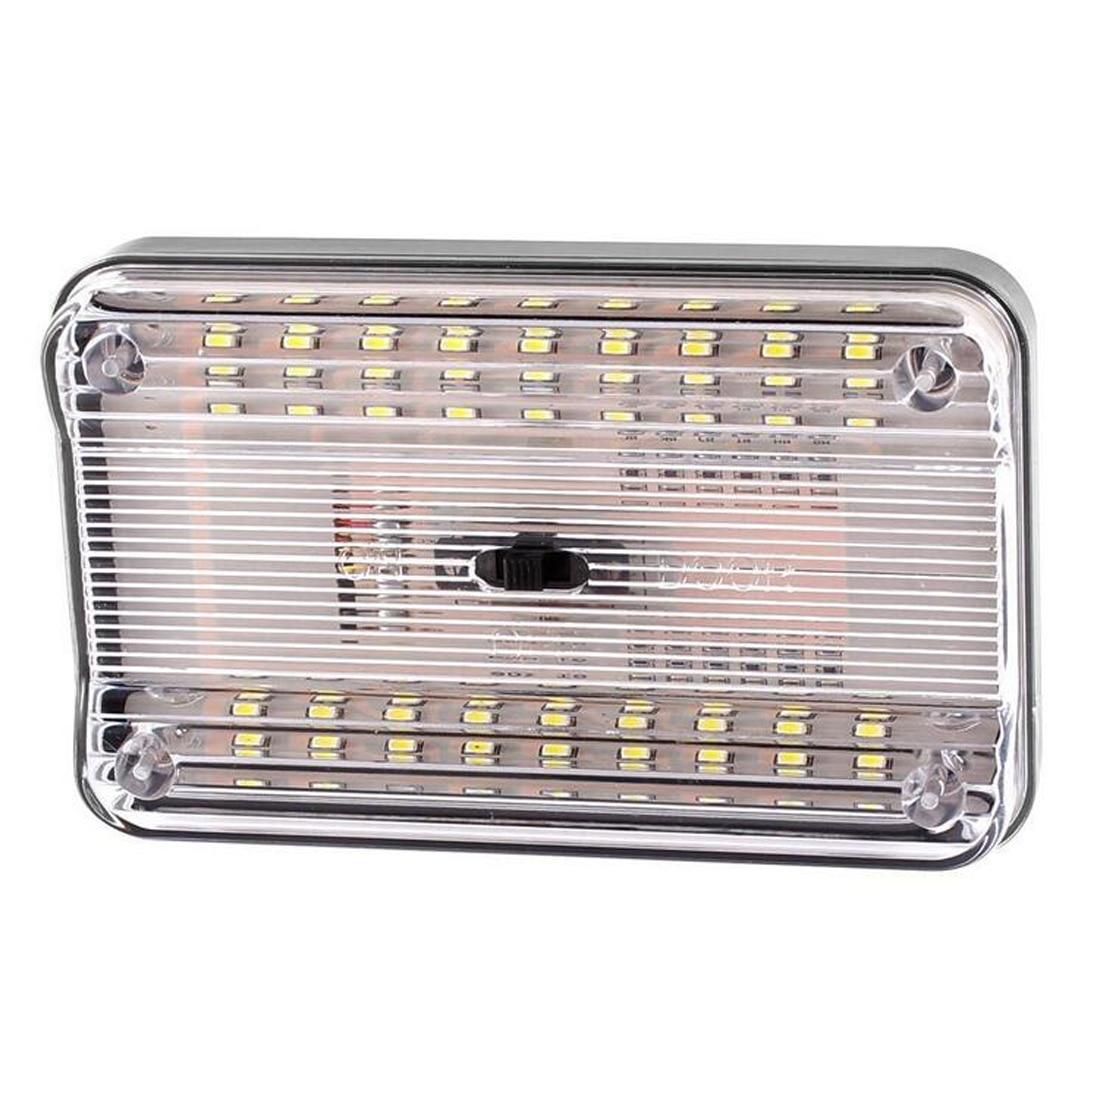 Aliexpress.com : Buy Tonewan Hot Sale Auto Led light Car Dome Light 36 SMD LED Roof Rectangular